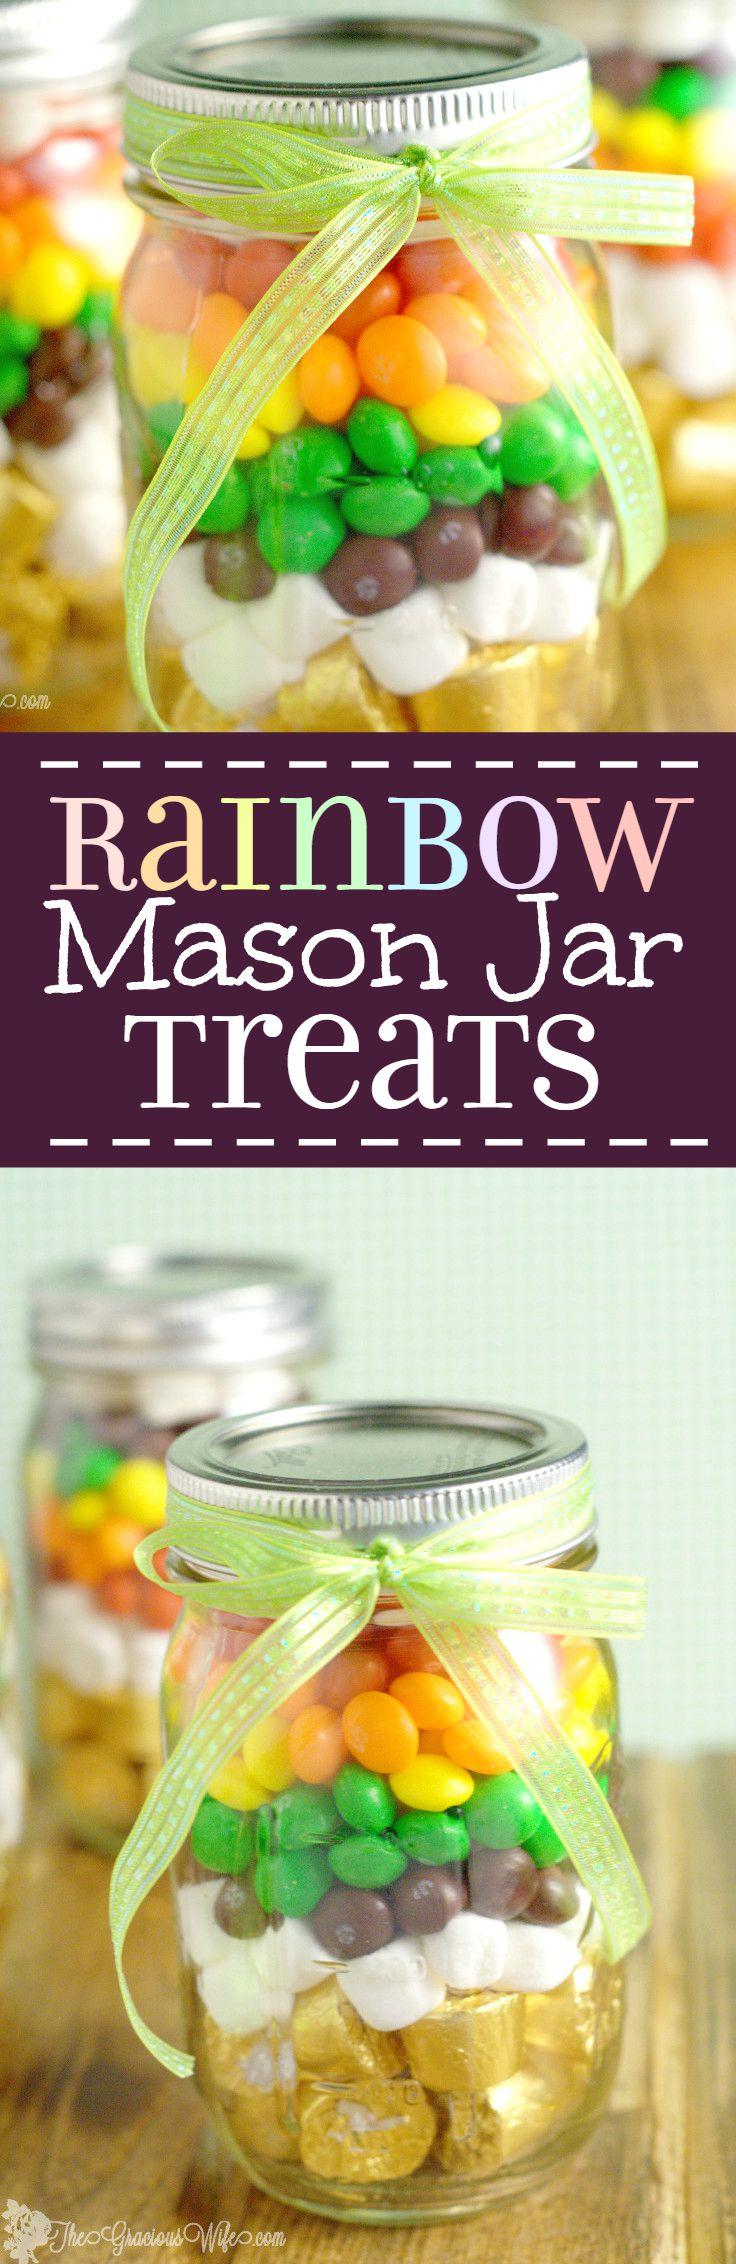 Rainbow Mason Jar Treats -a fun St Patrick's Day treat in a mason jar, perfect for kids or a DIY gift idea for teachers or friends.  Super cute rainbow party favor too! | DIY crafts | mason jars